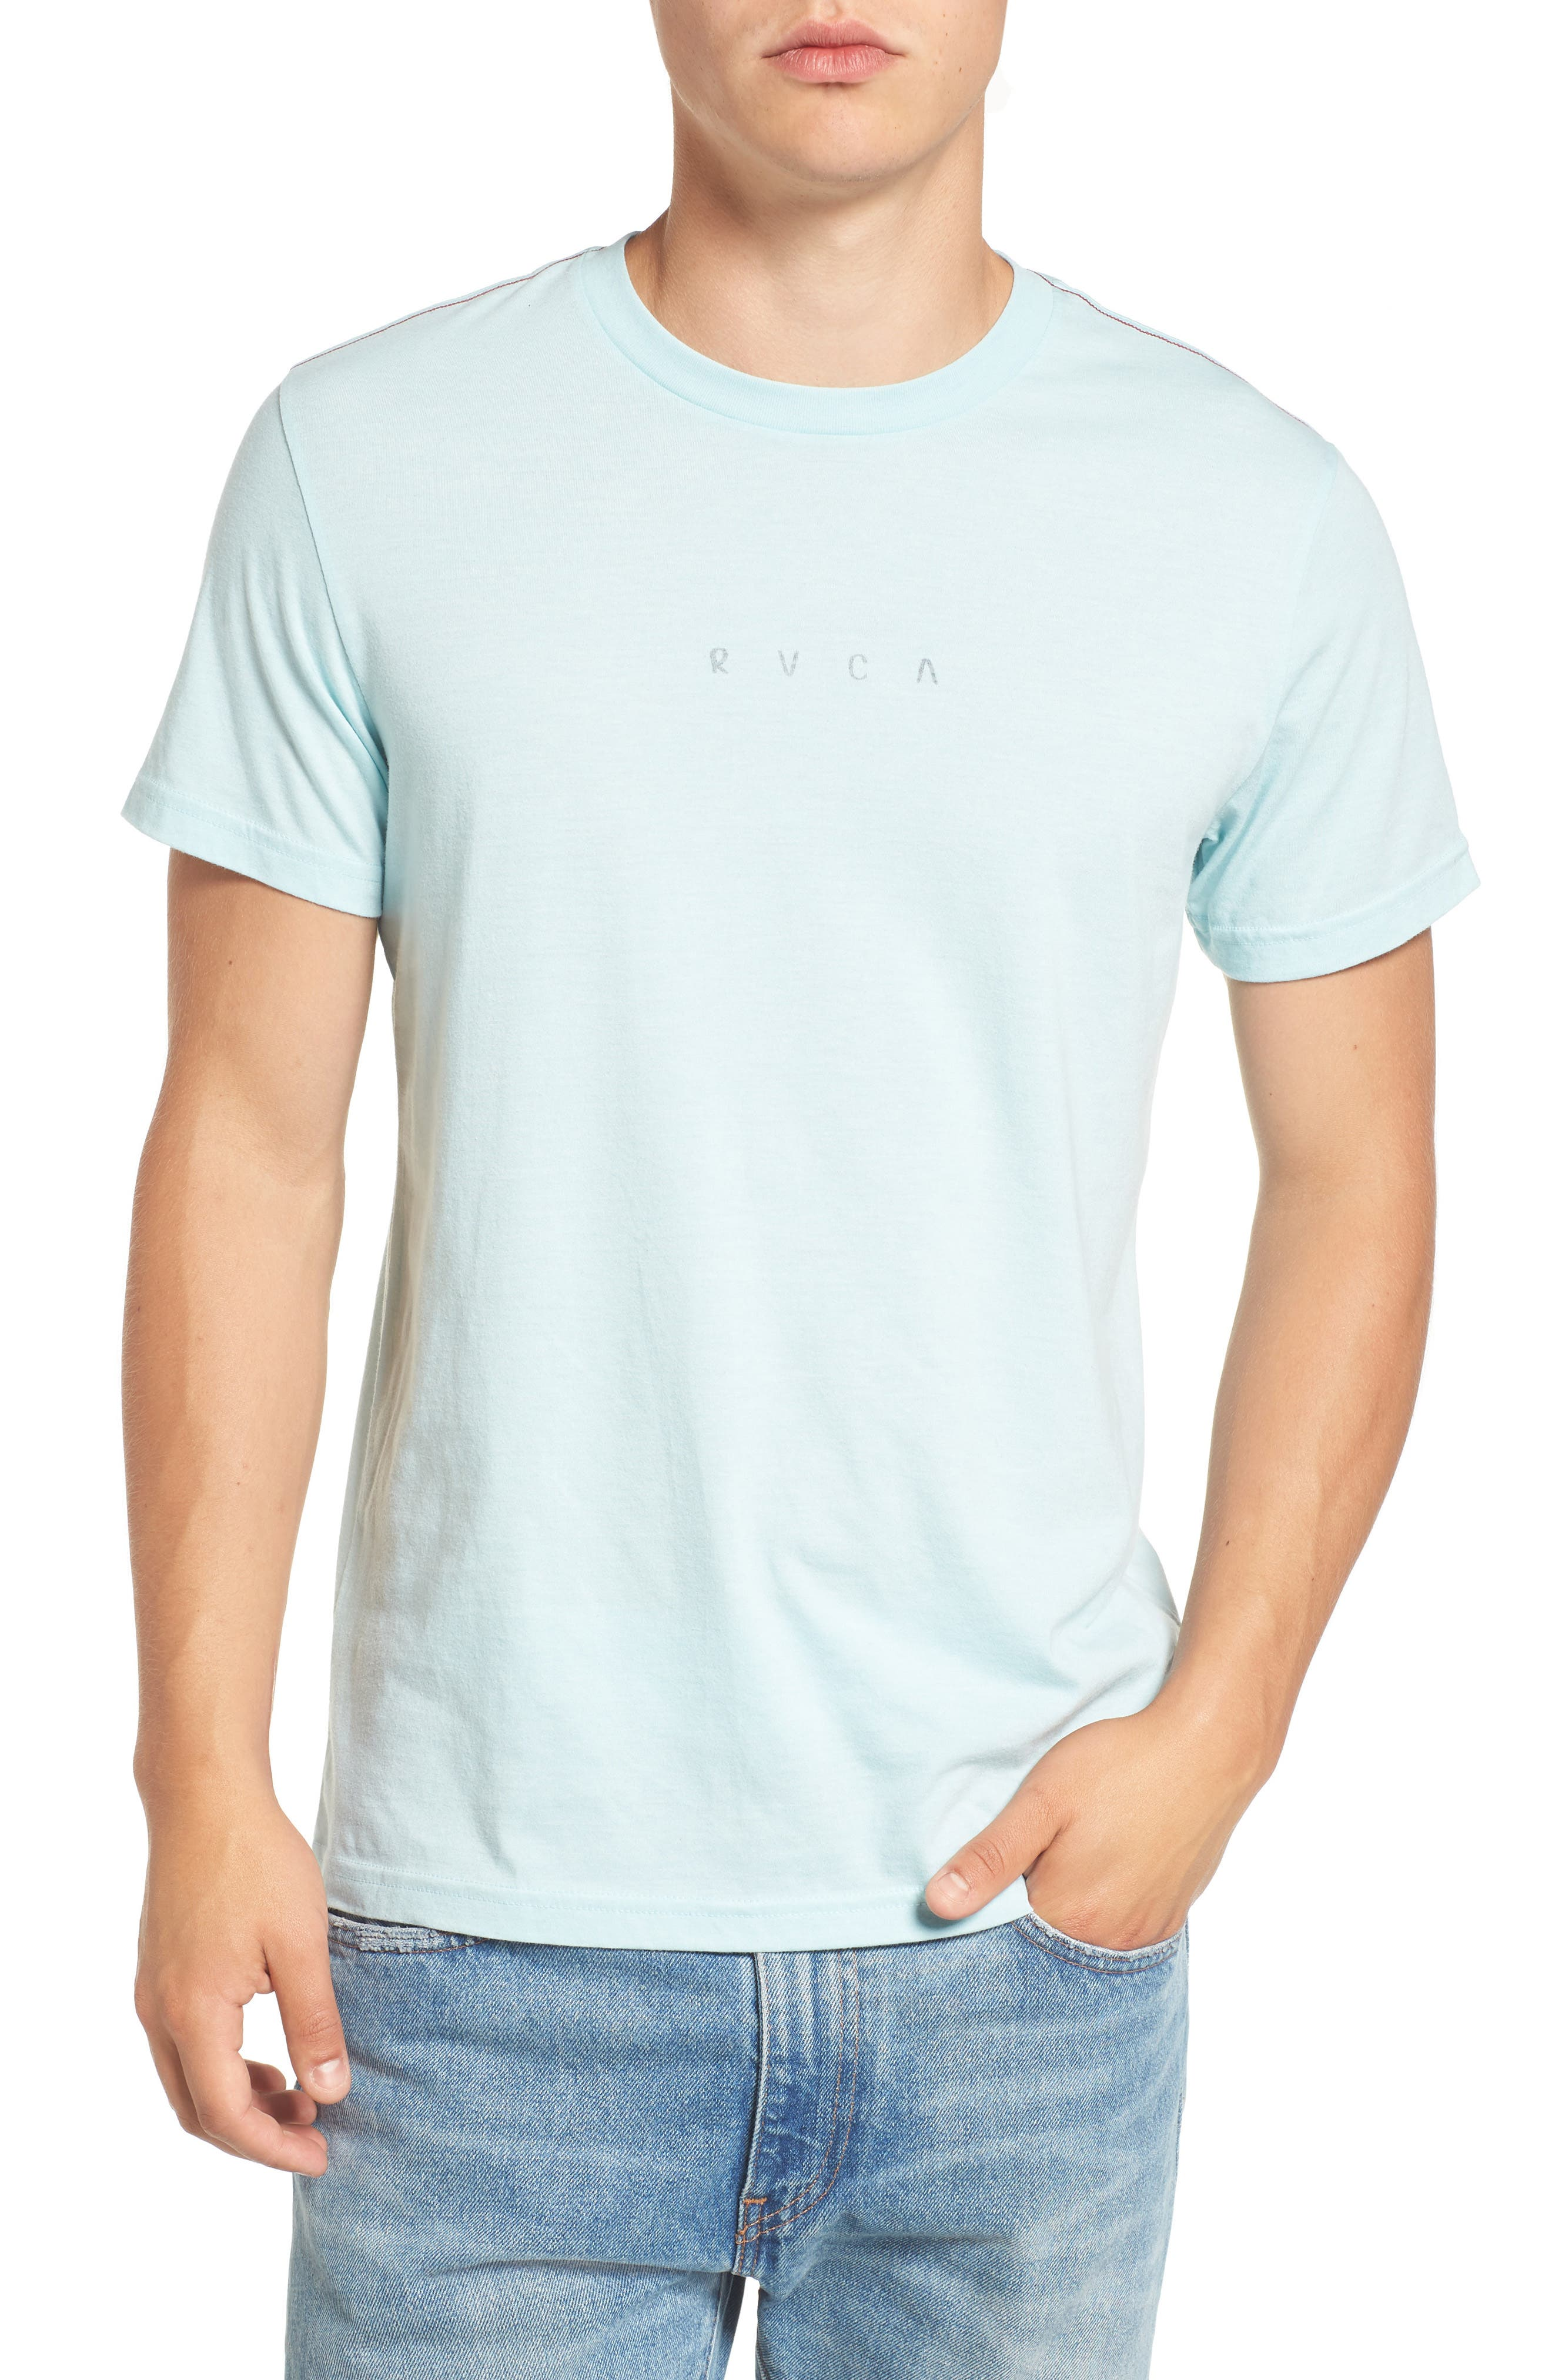 Snooze Cloud Graphic T-Shirt,                             Main thumbnail 2, color,